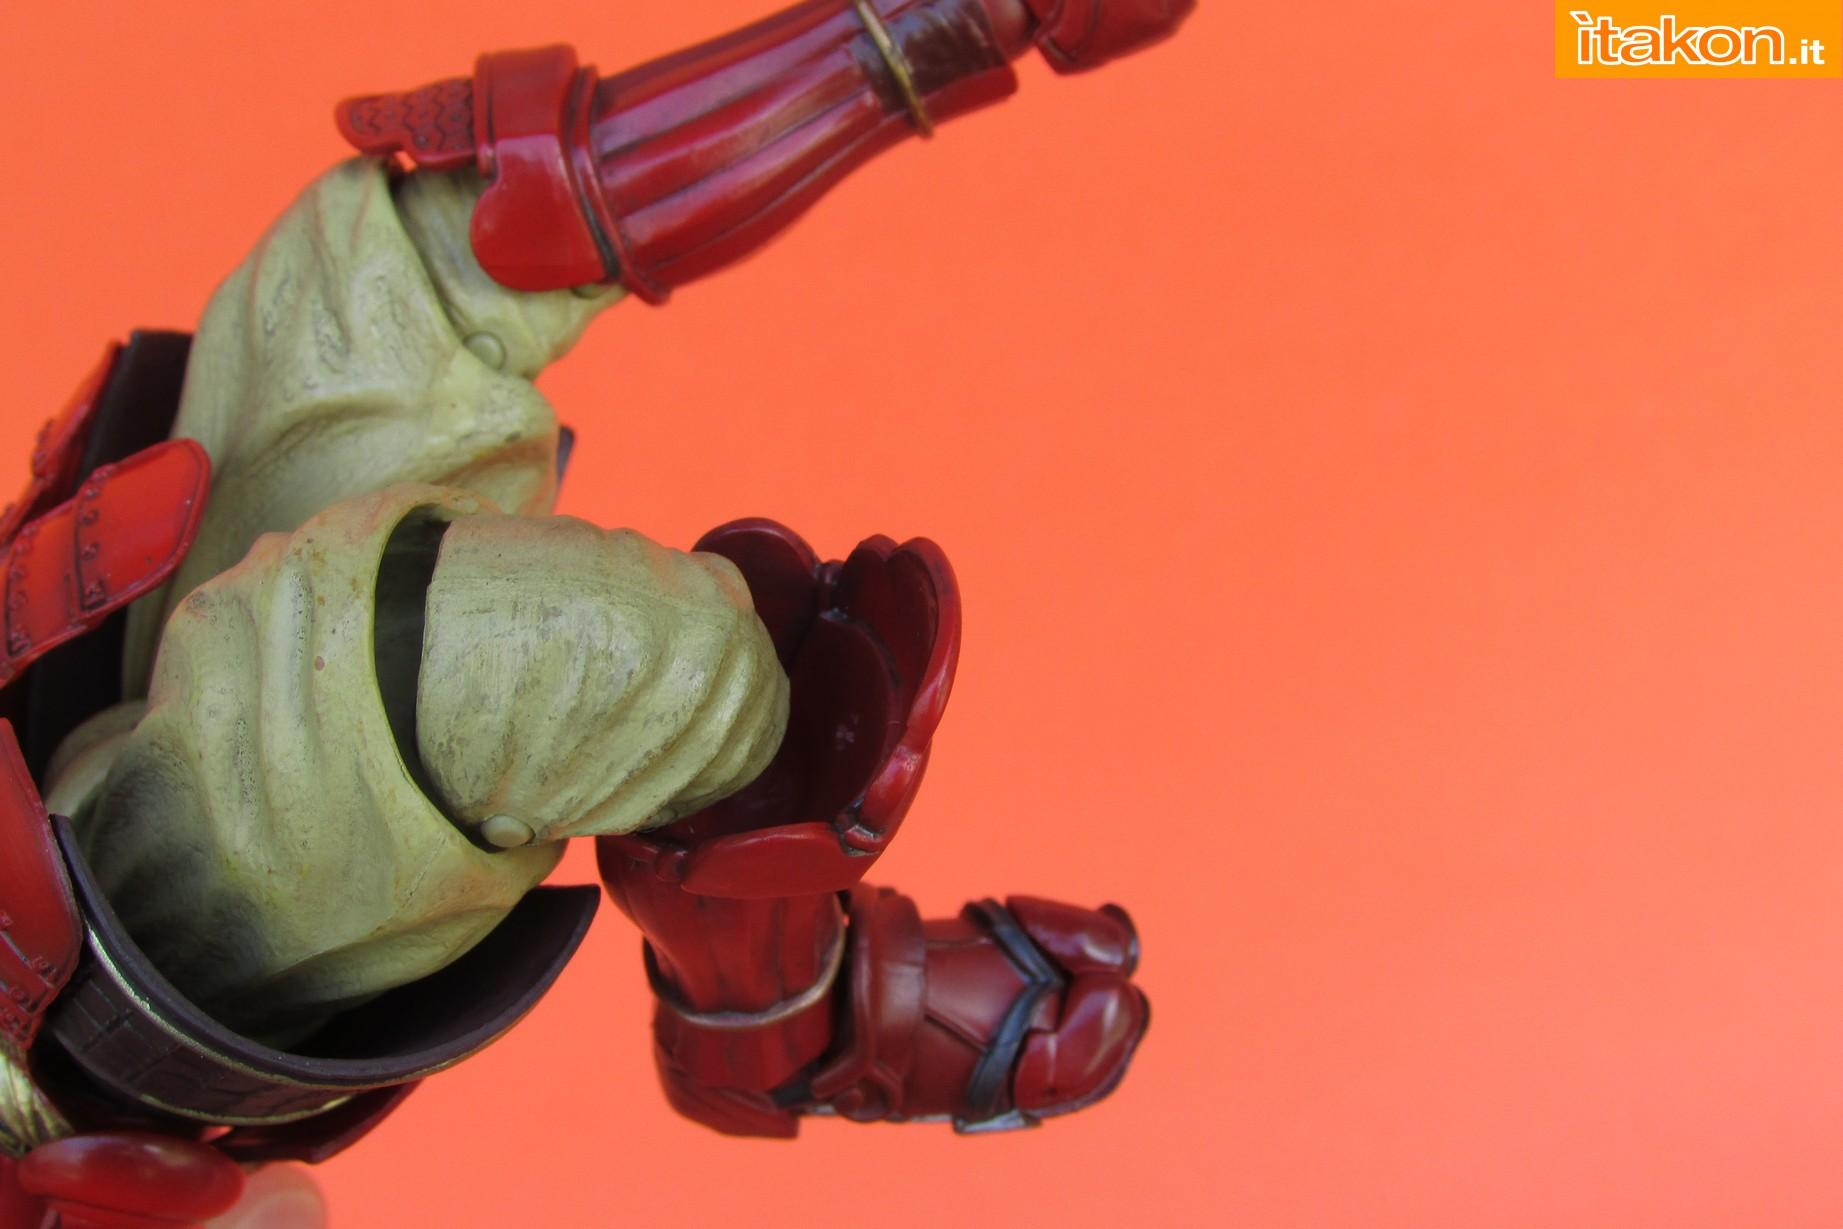 Link a Marvel Comics Koutetsu Samurai Iron Man Mark 3 Meishou MANGA REALIZATION review Bandai Itakon.it30